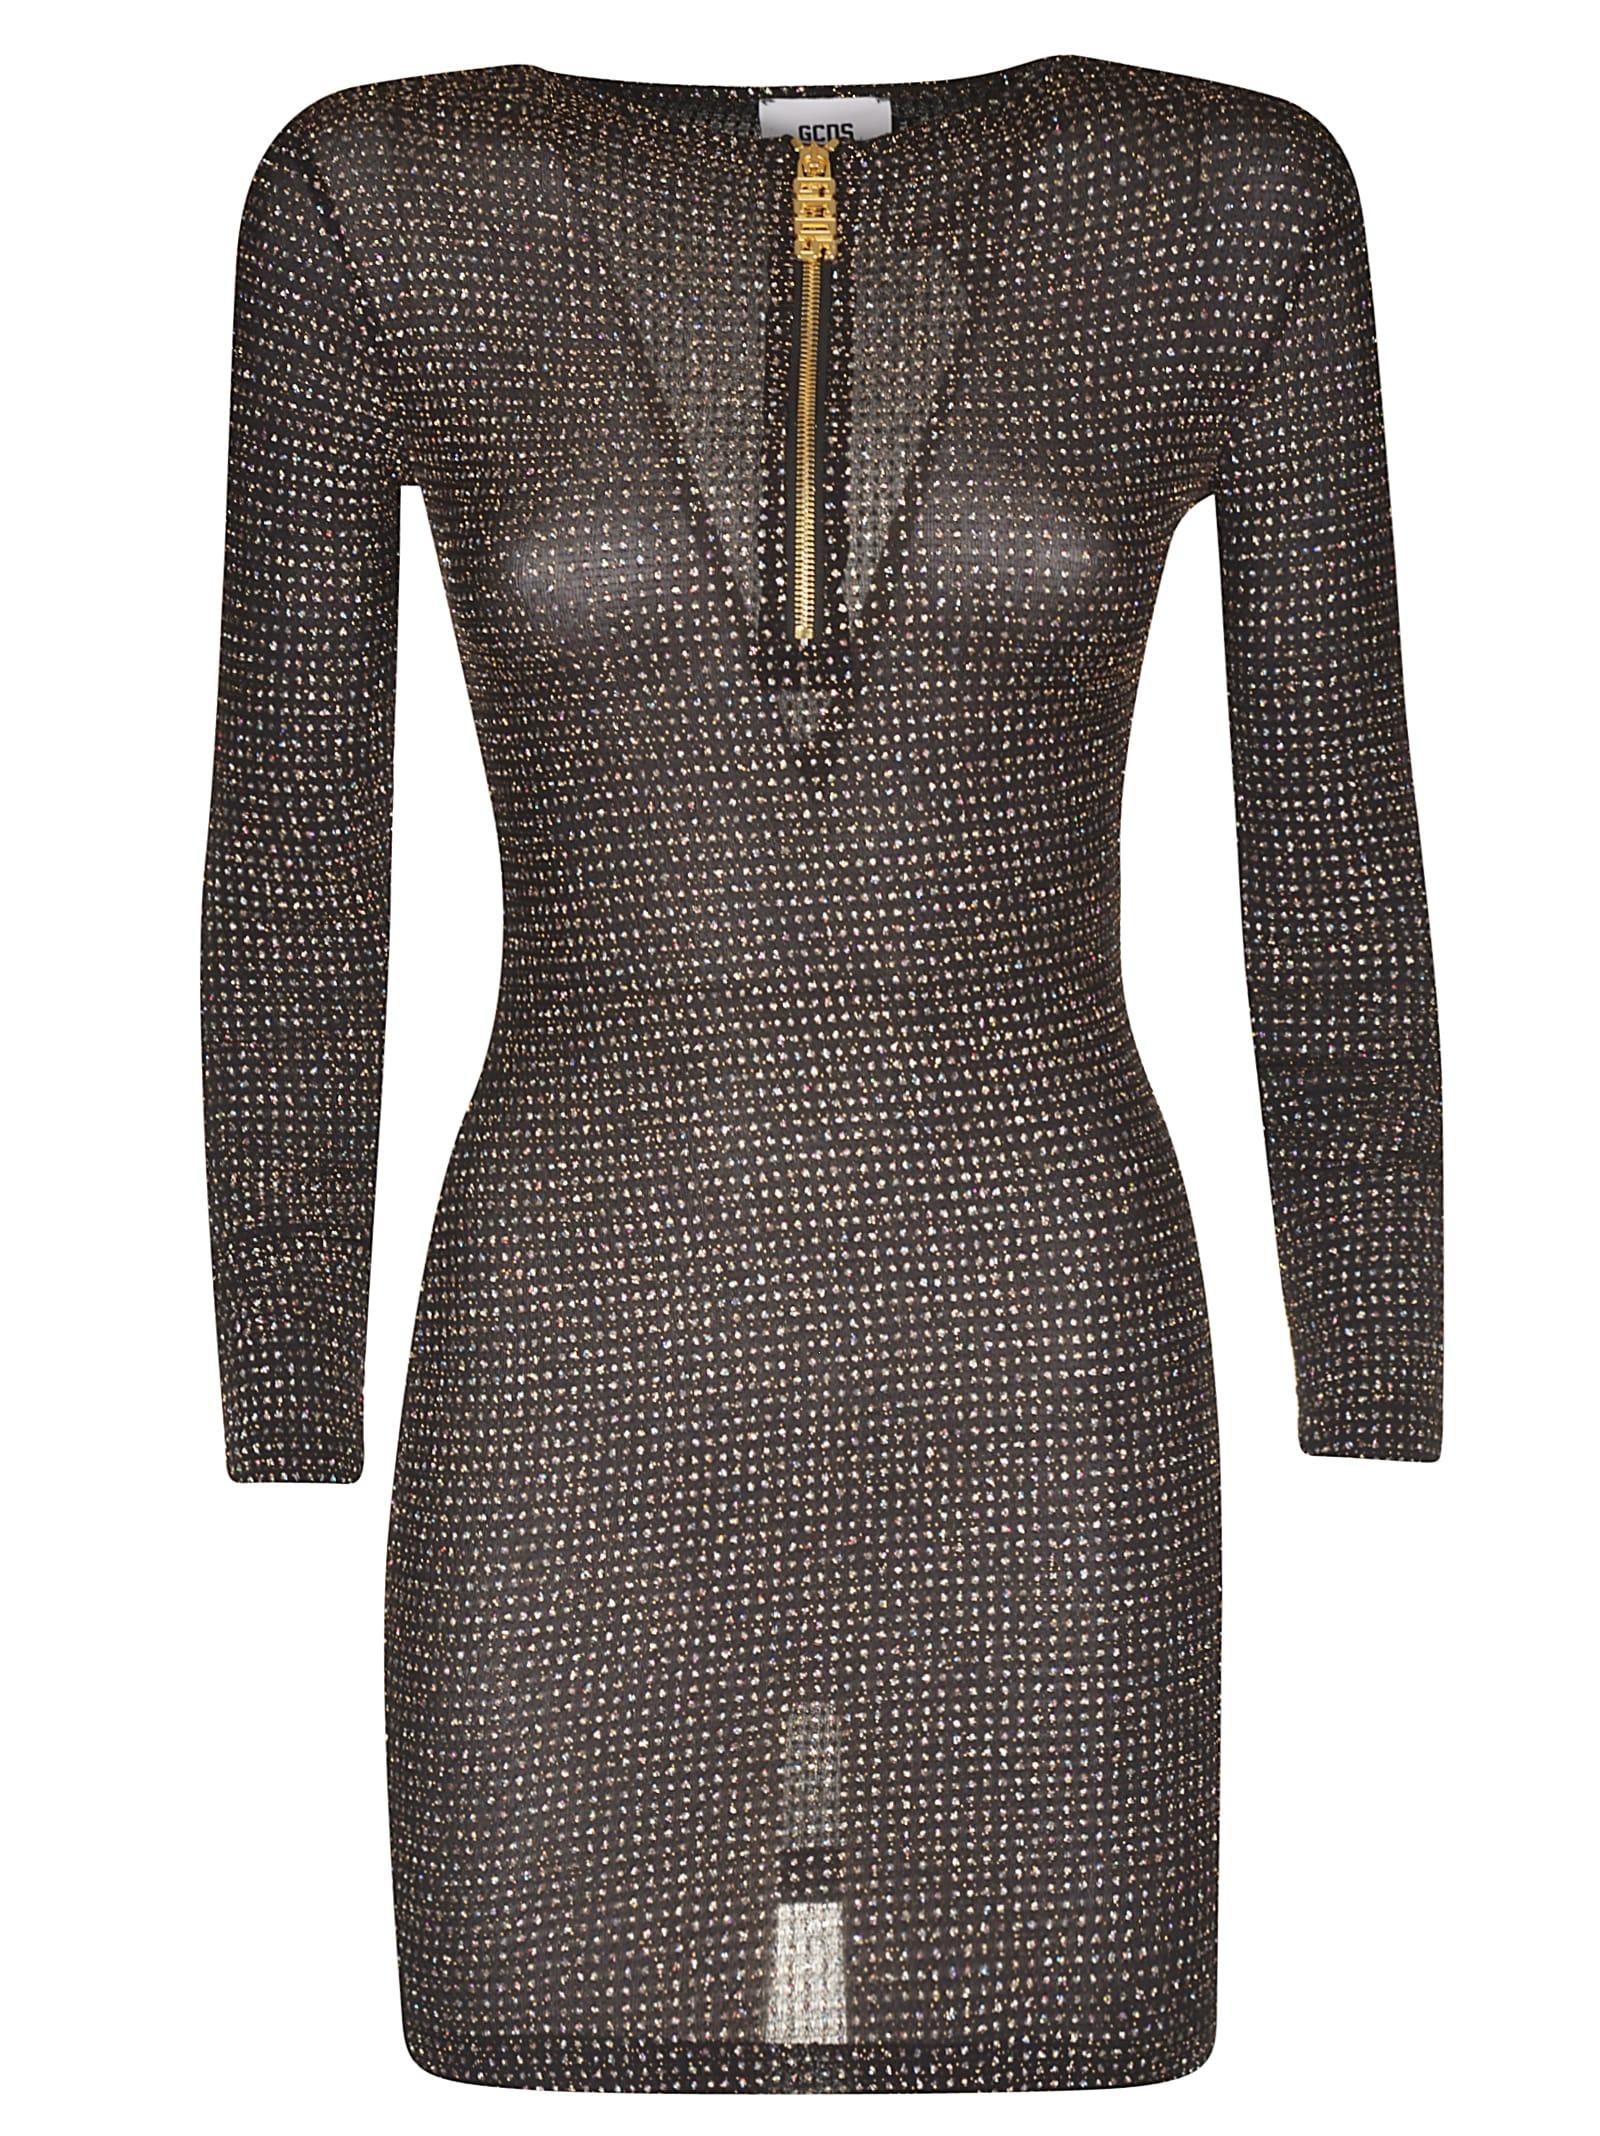 GCDS Front Zipped Dress